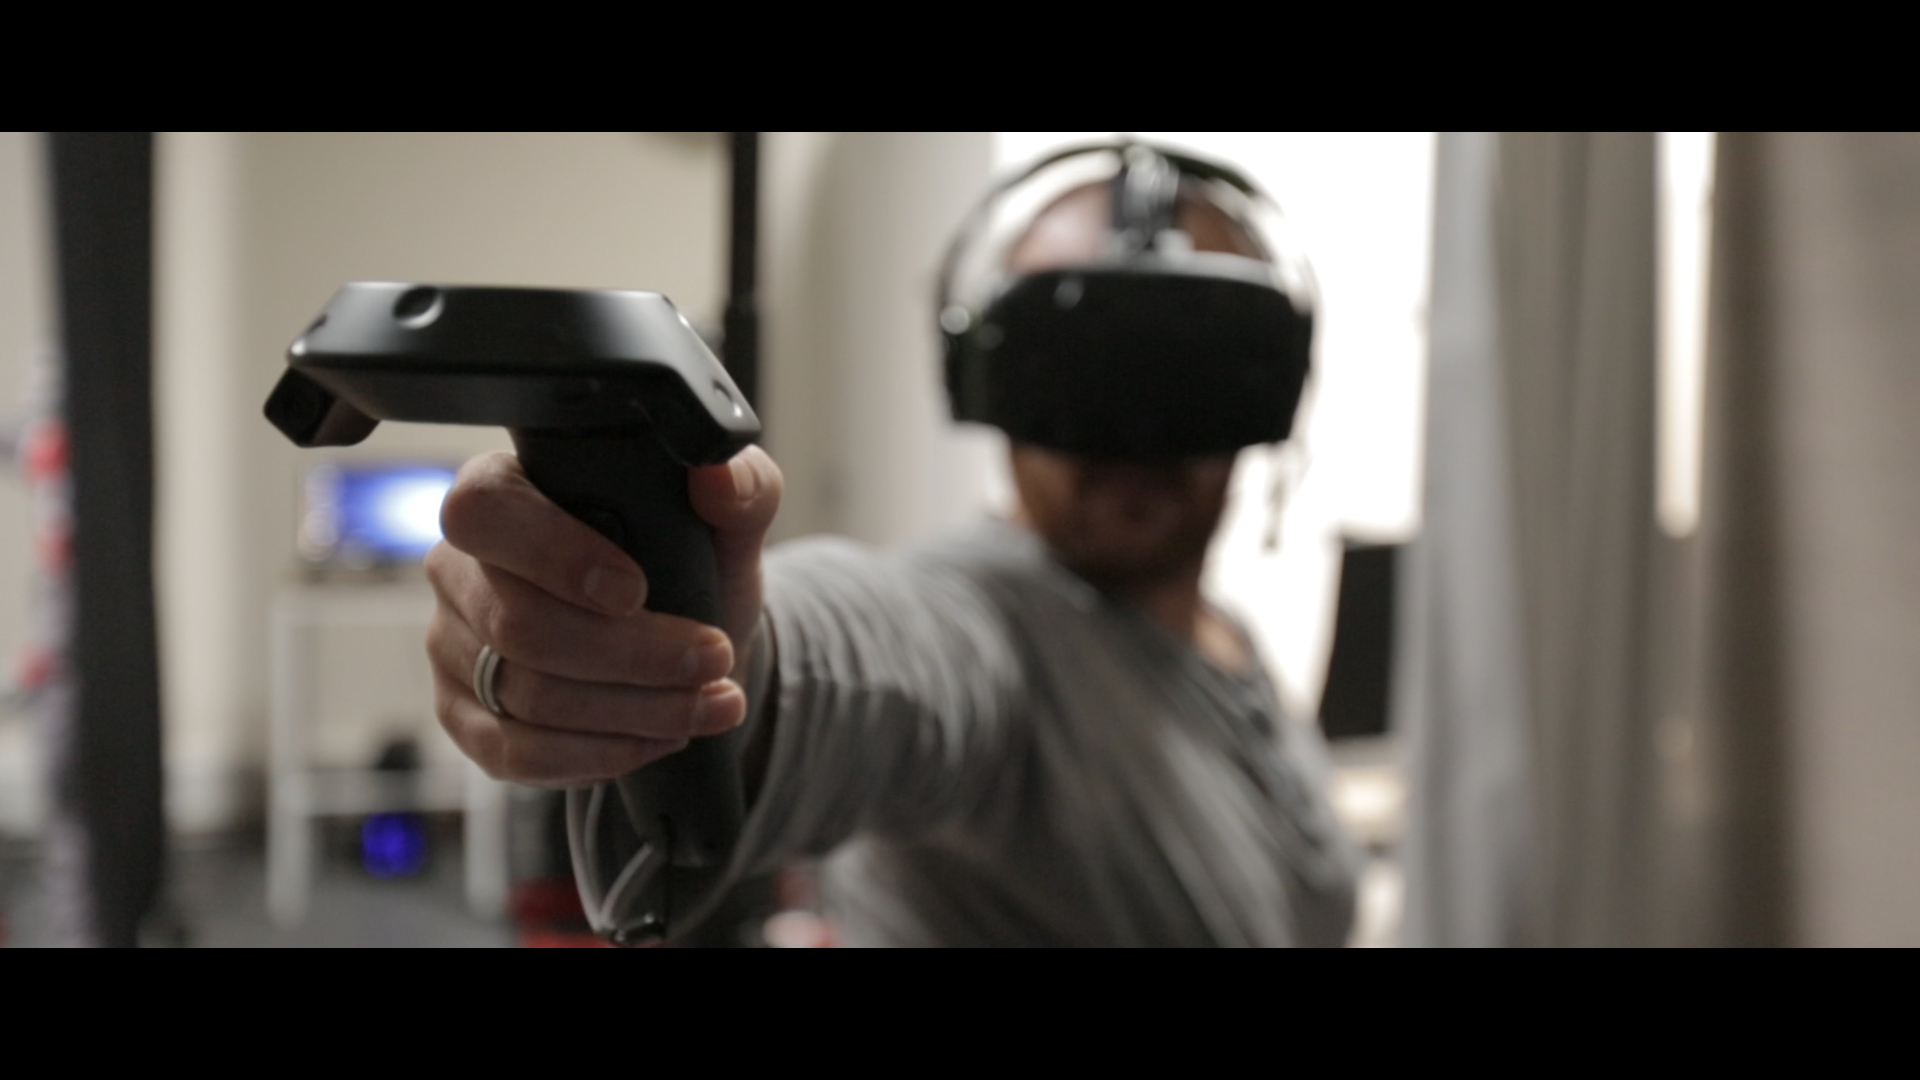 xaleo-leo-meslet-casque-vr-360-degre-video